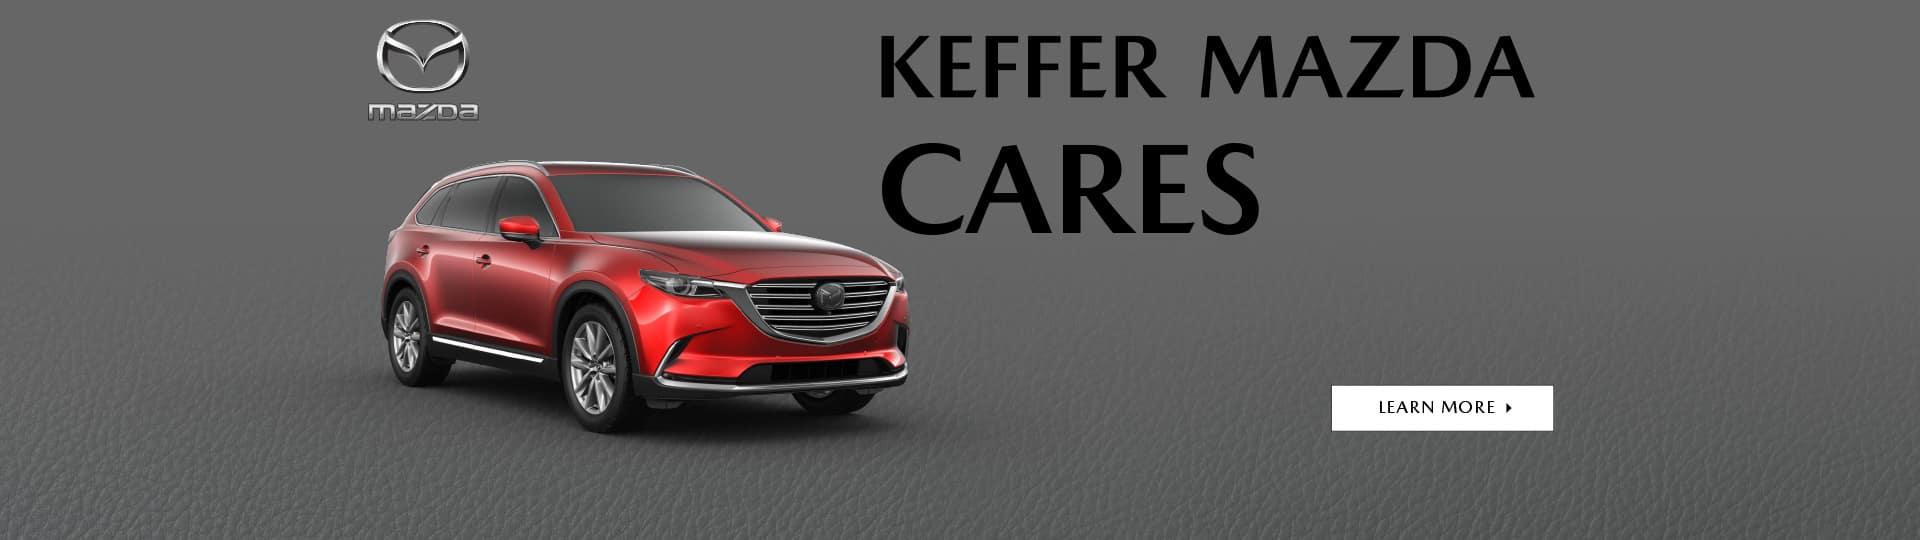 2021.09.14-Keffer-Mazda-Cares-Web-Banner-S54114vw